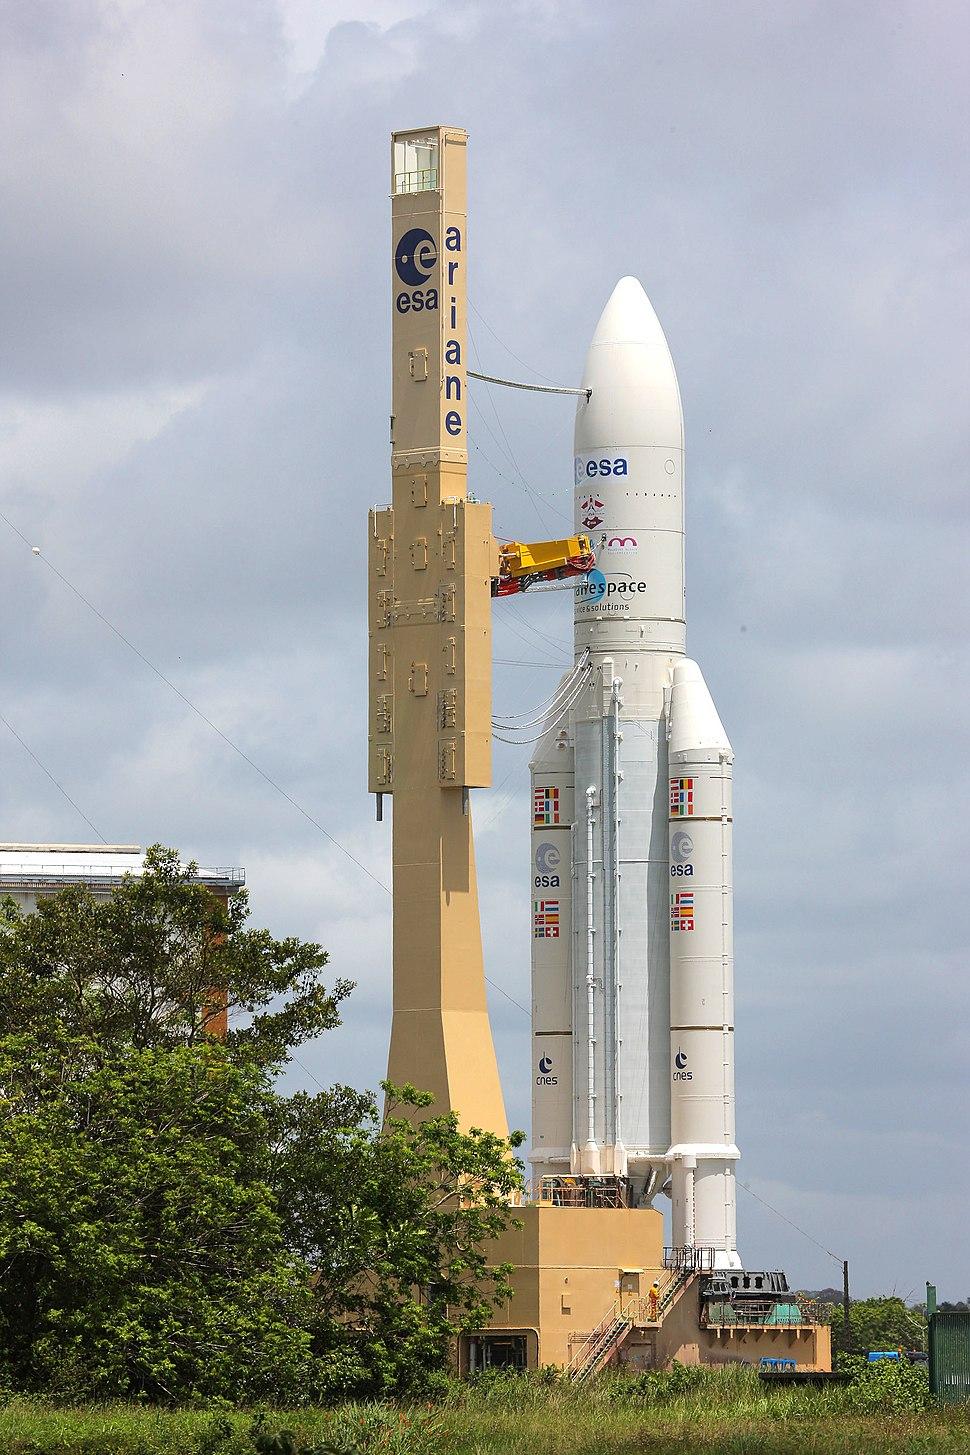 Ariane 5ES with ATV 4 on its way to ELA-3